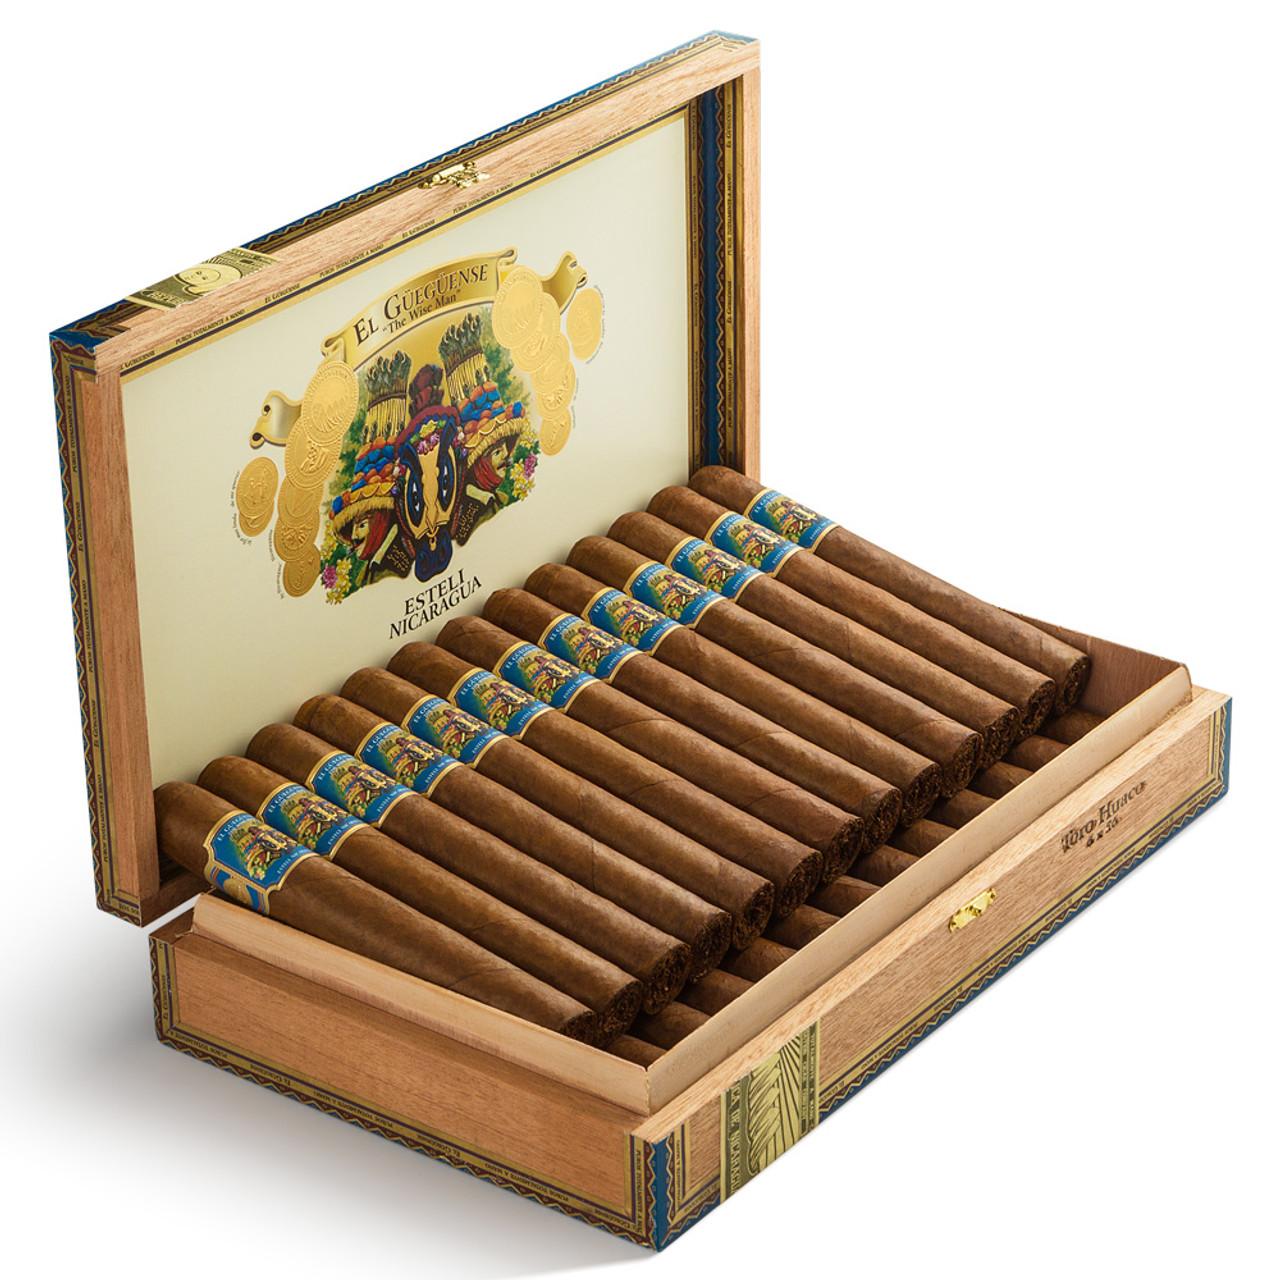 Foundation El Gueguense Toro Huaco Cigars - 6 x 56 (Box of 25)